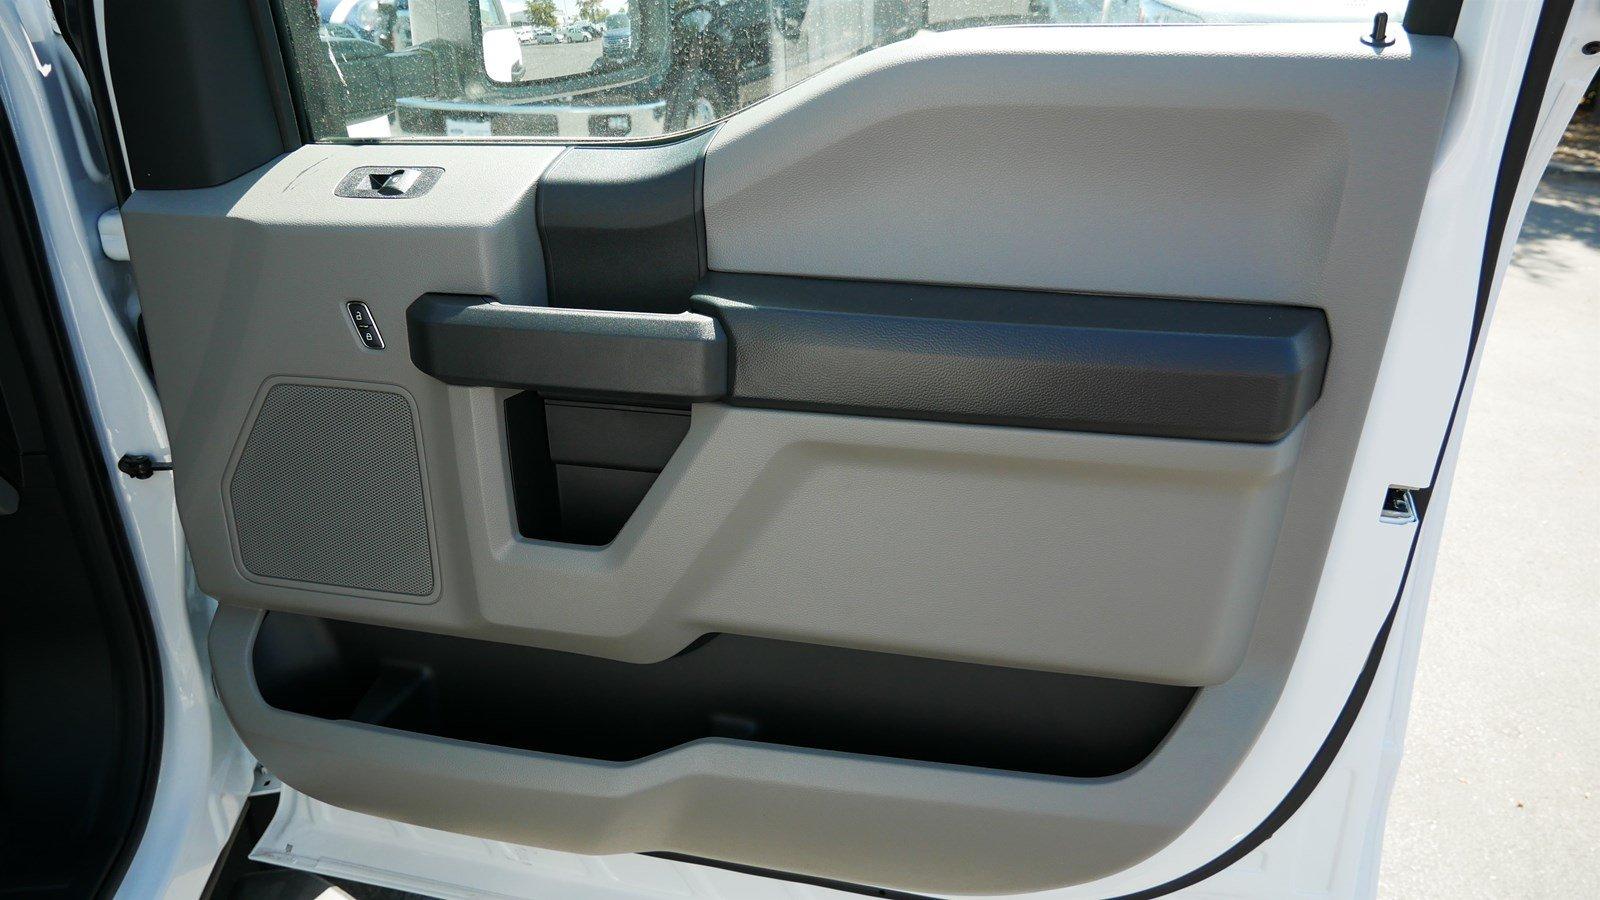 2019 F-550 Regular Cab DRW 4x4,  Scelzi Contractor Body #69285 - photo 24